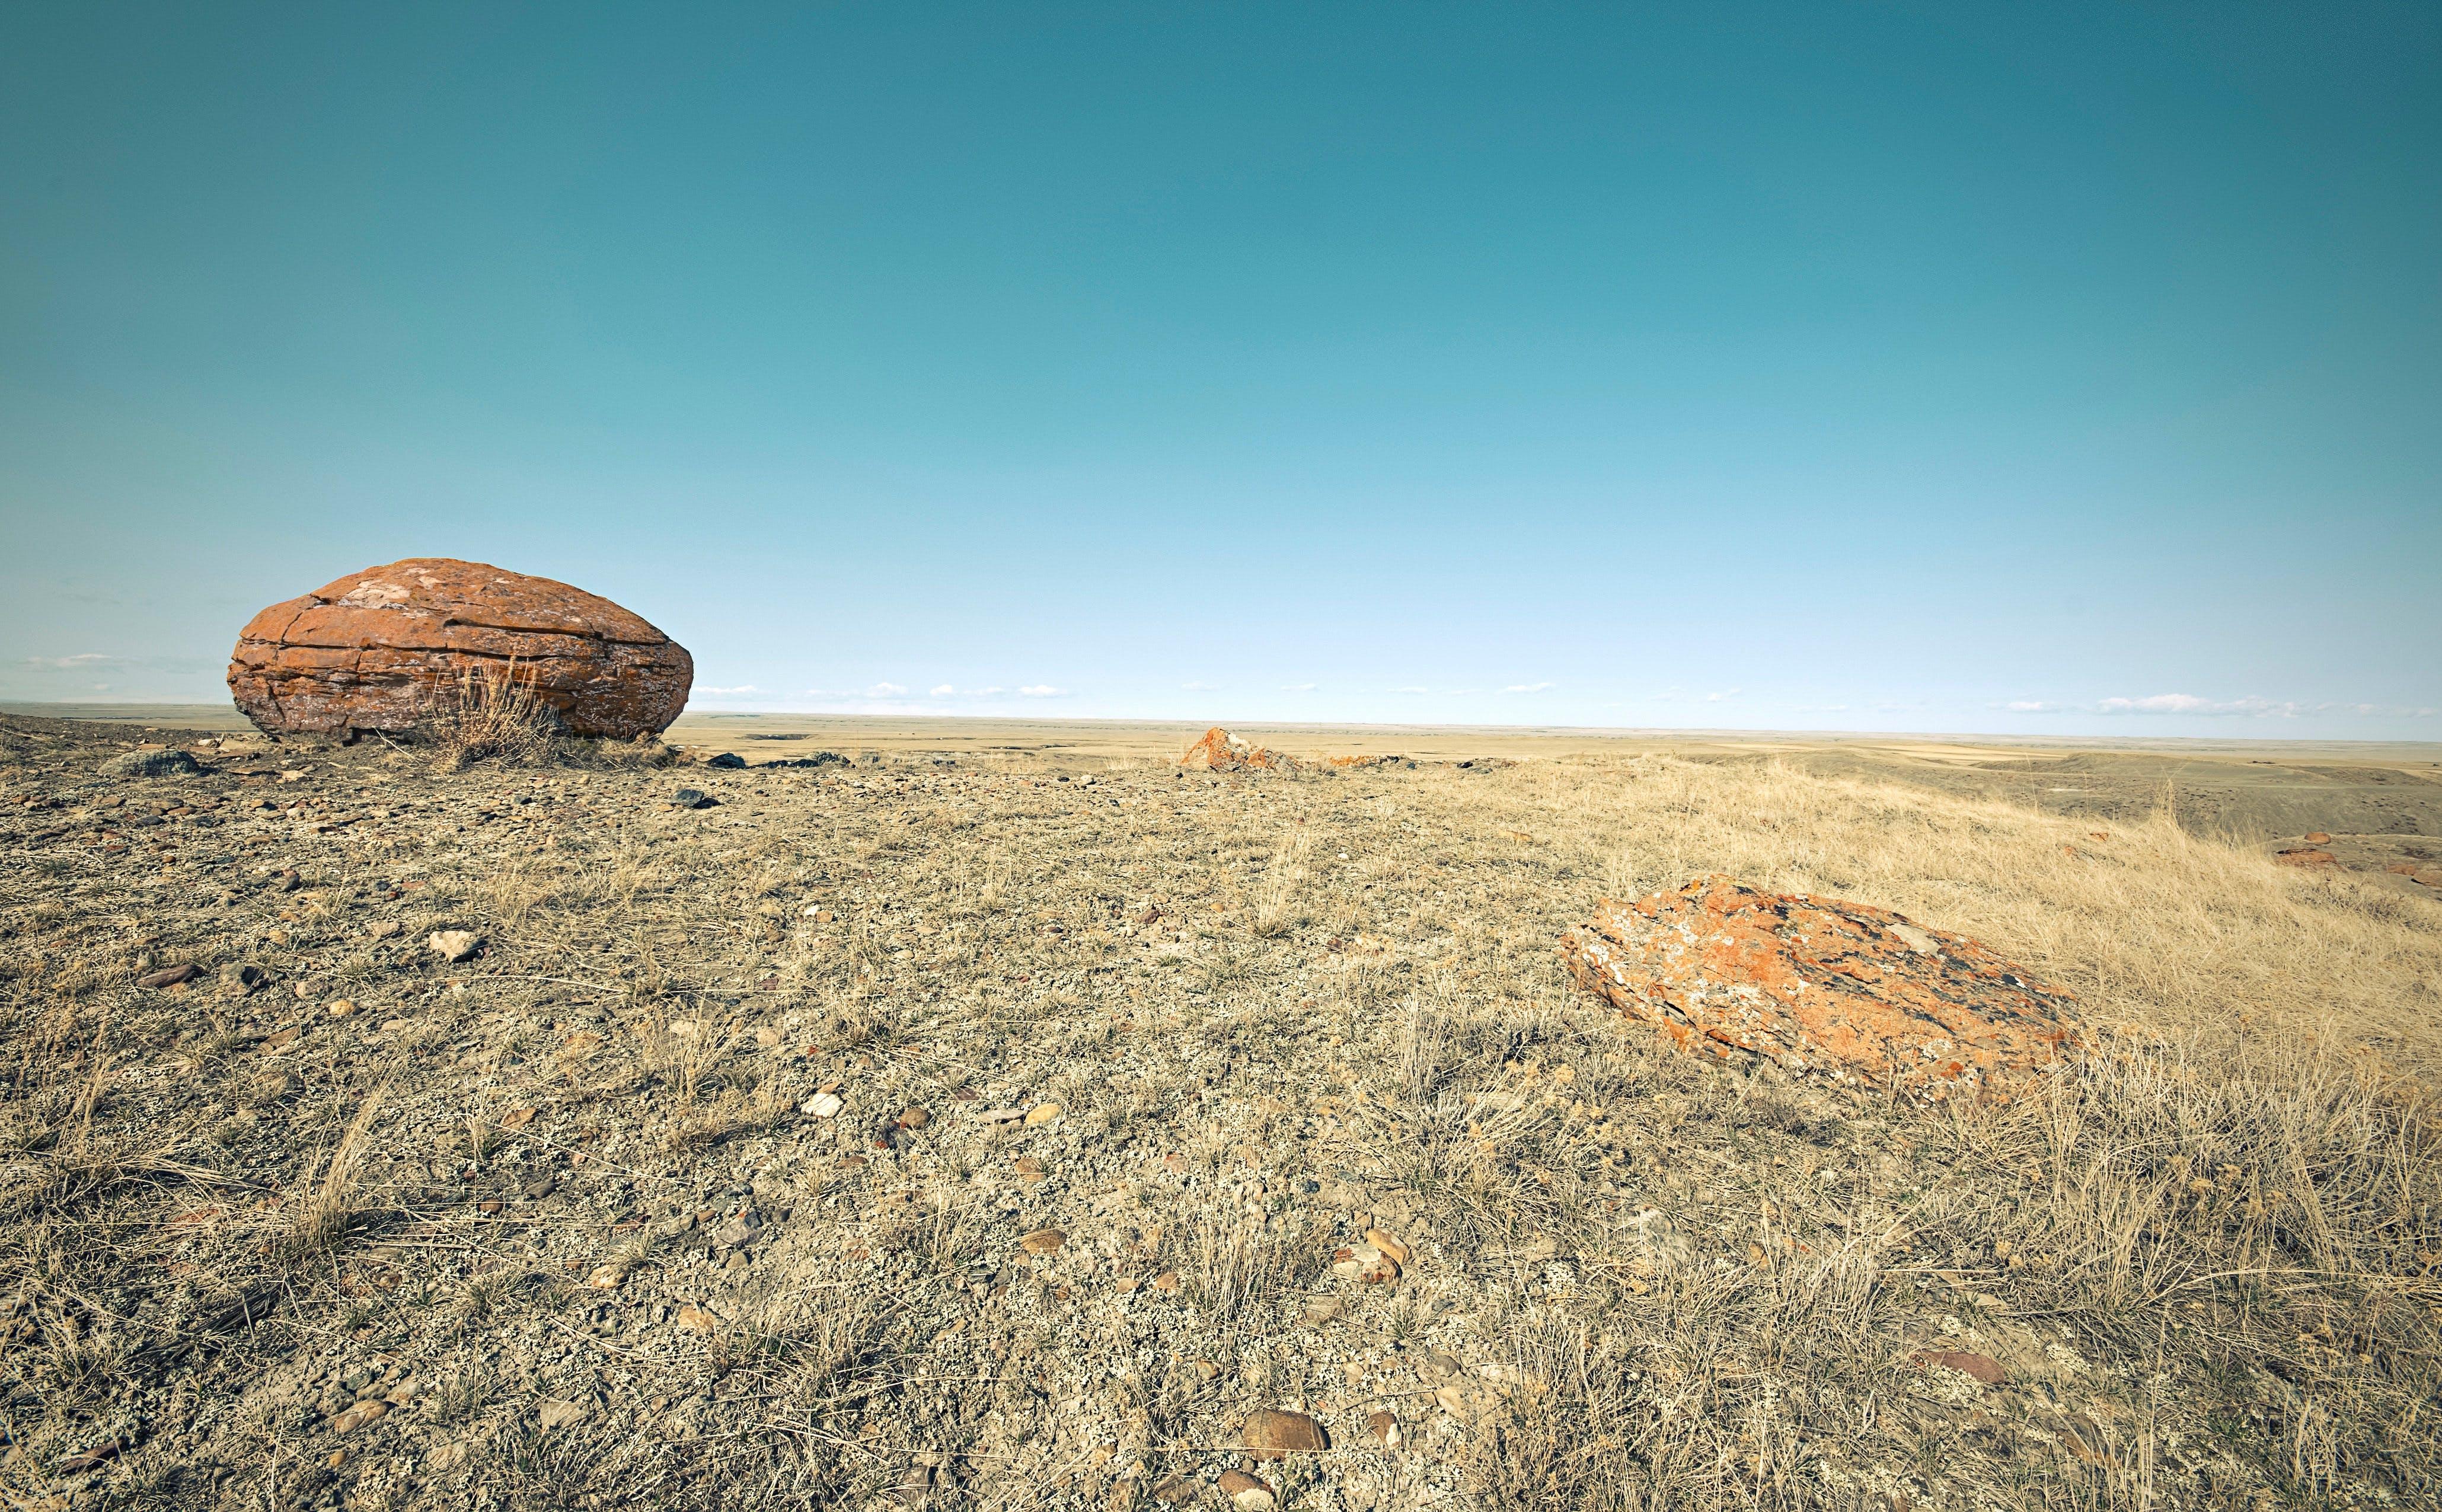 Brown Rock on Green Grassland